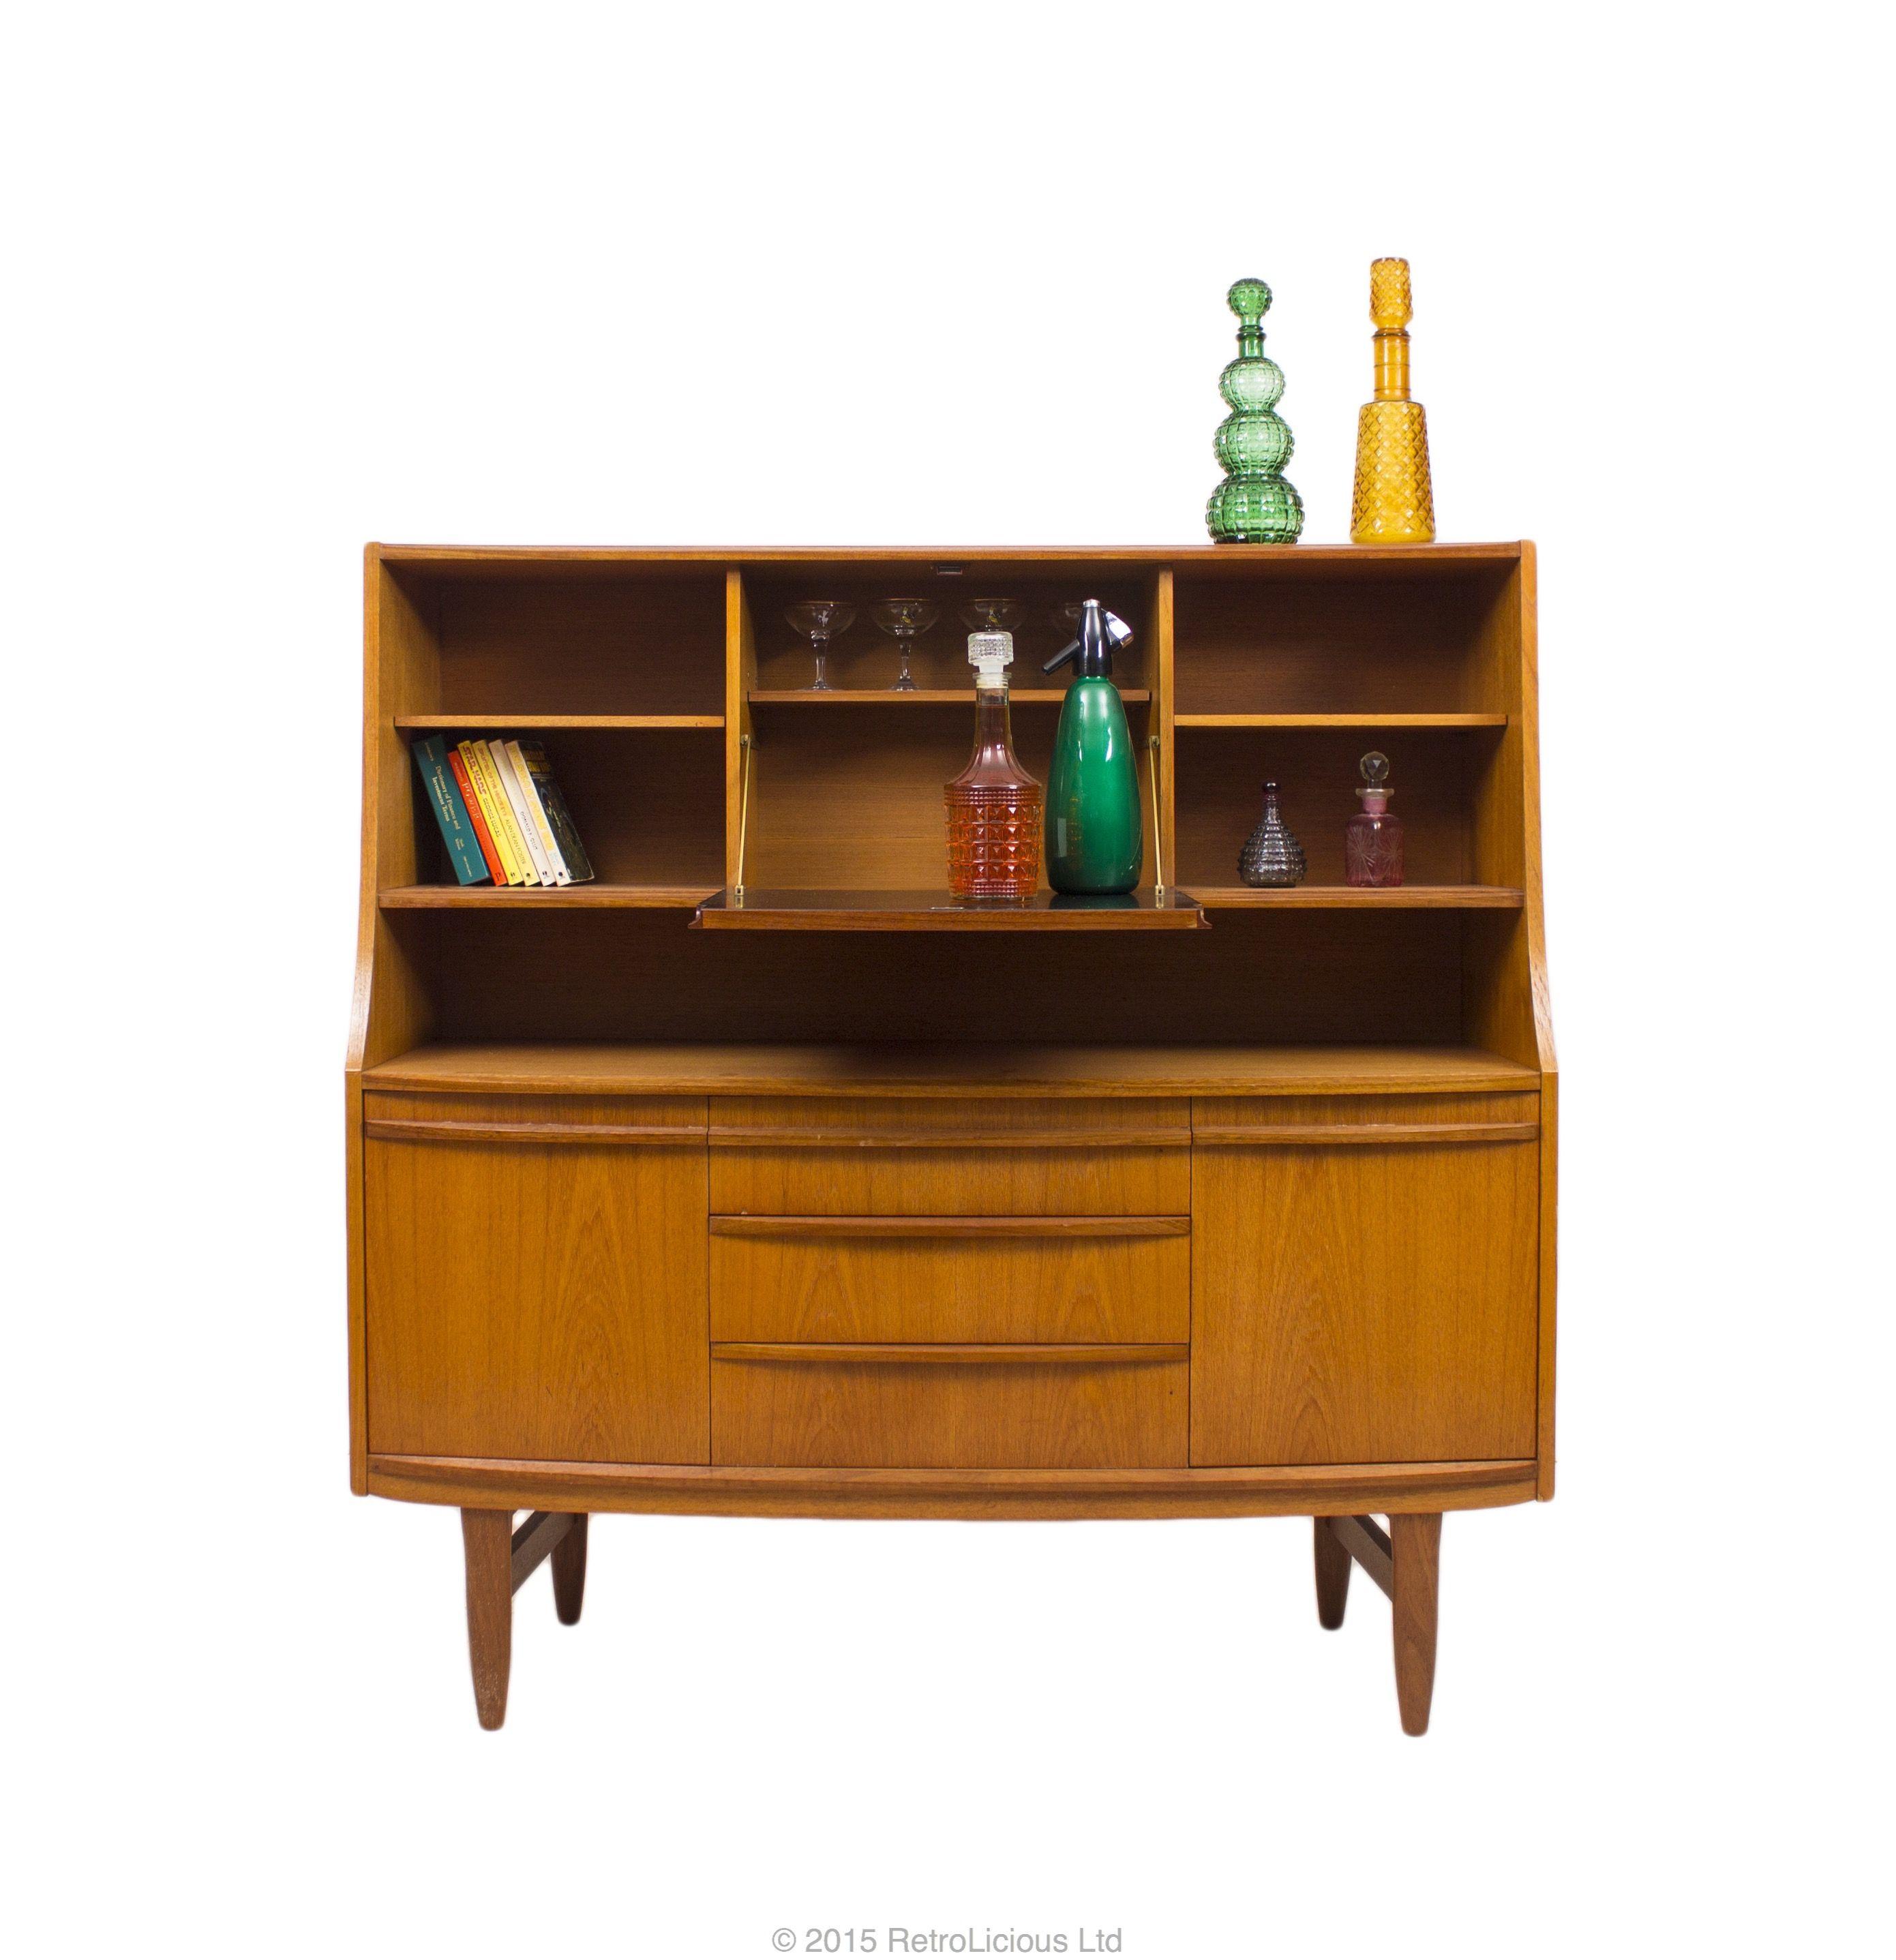 Danish Style Teak Highboard Drinks Cabinet Sideboard Credenza Storage G